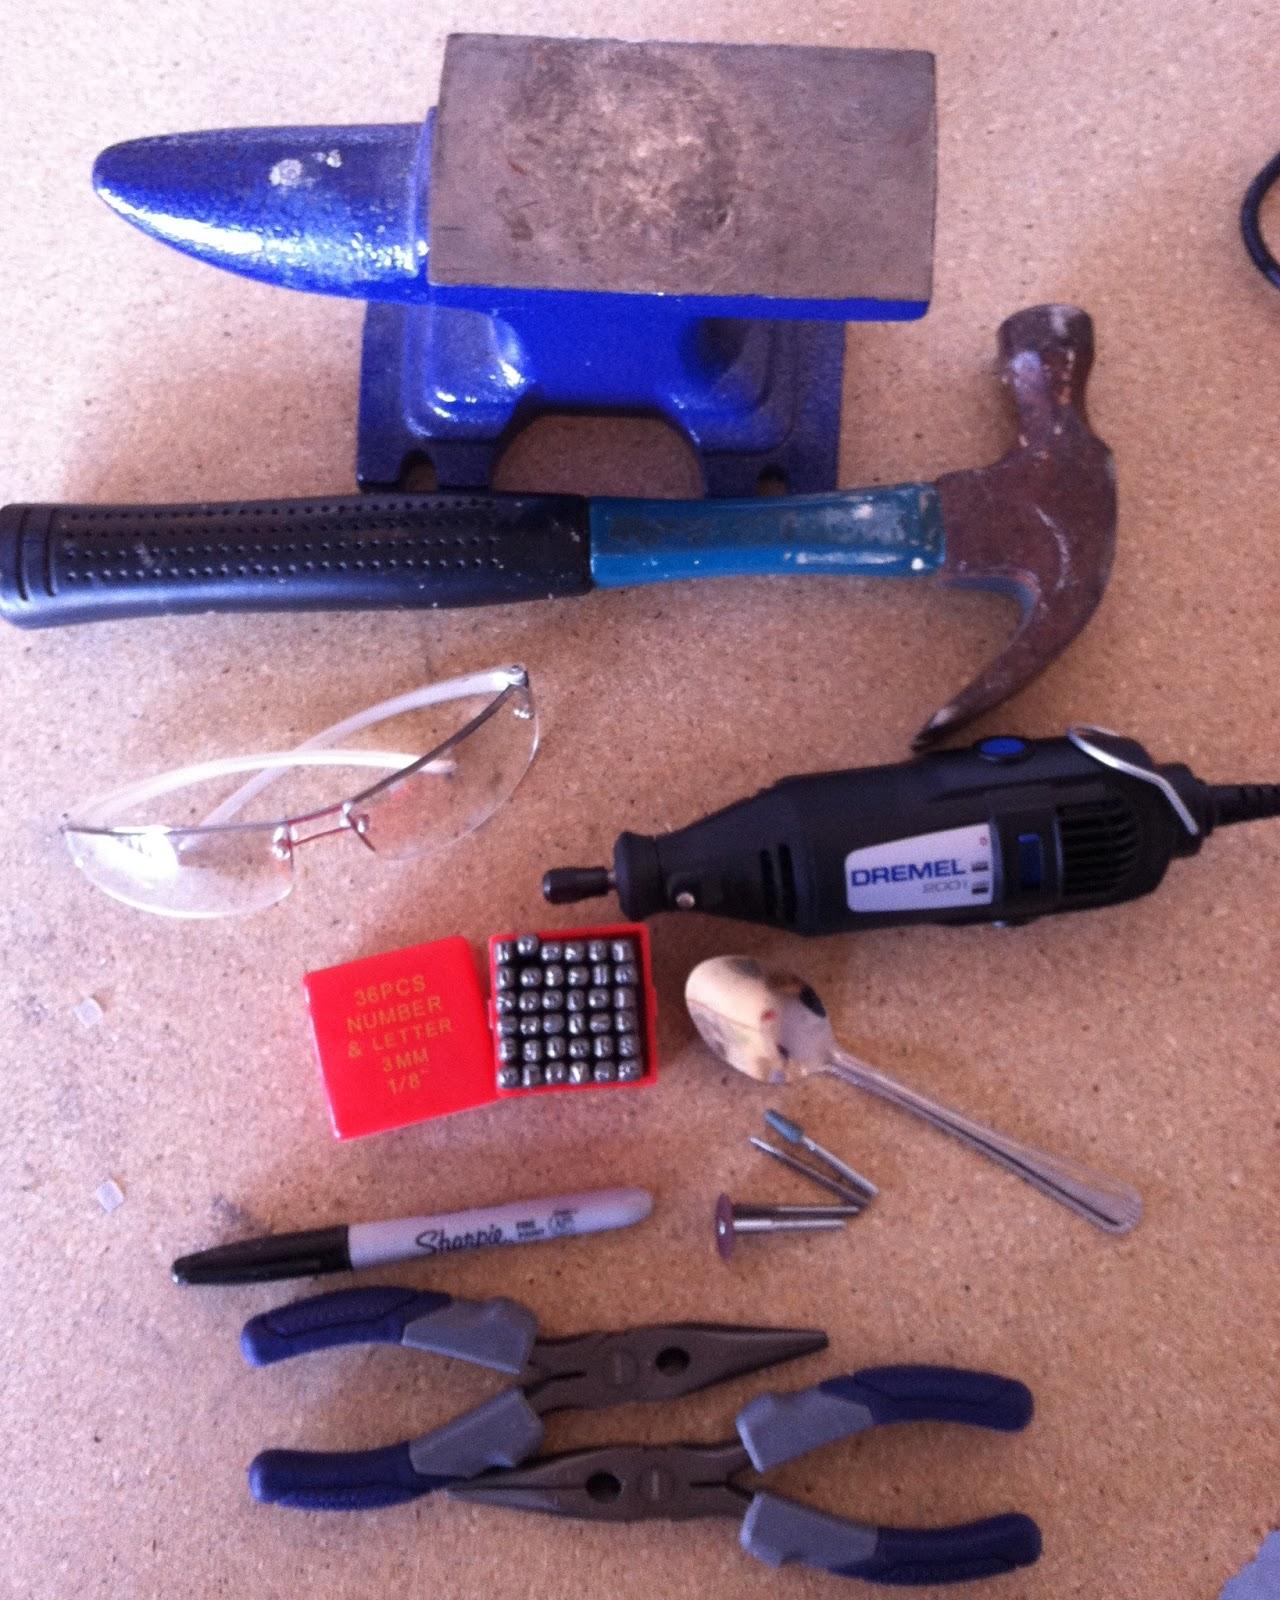 Upcycled Stuff: DIY Spoon Pendant